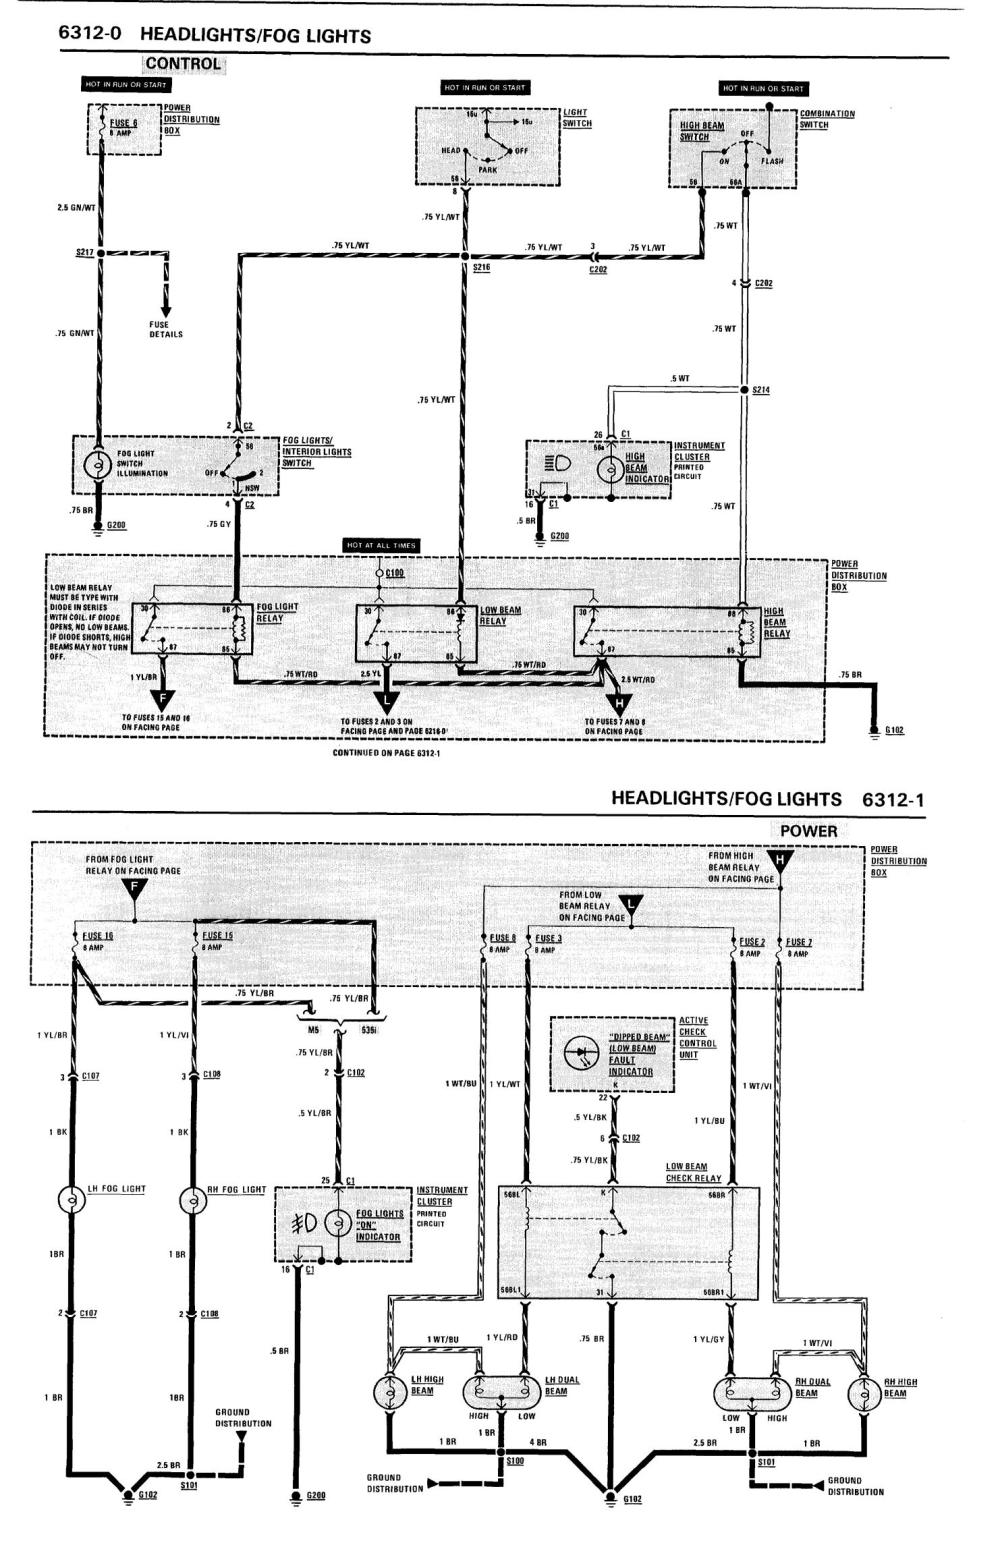 medium resolution of e28 fuse box diagram